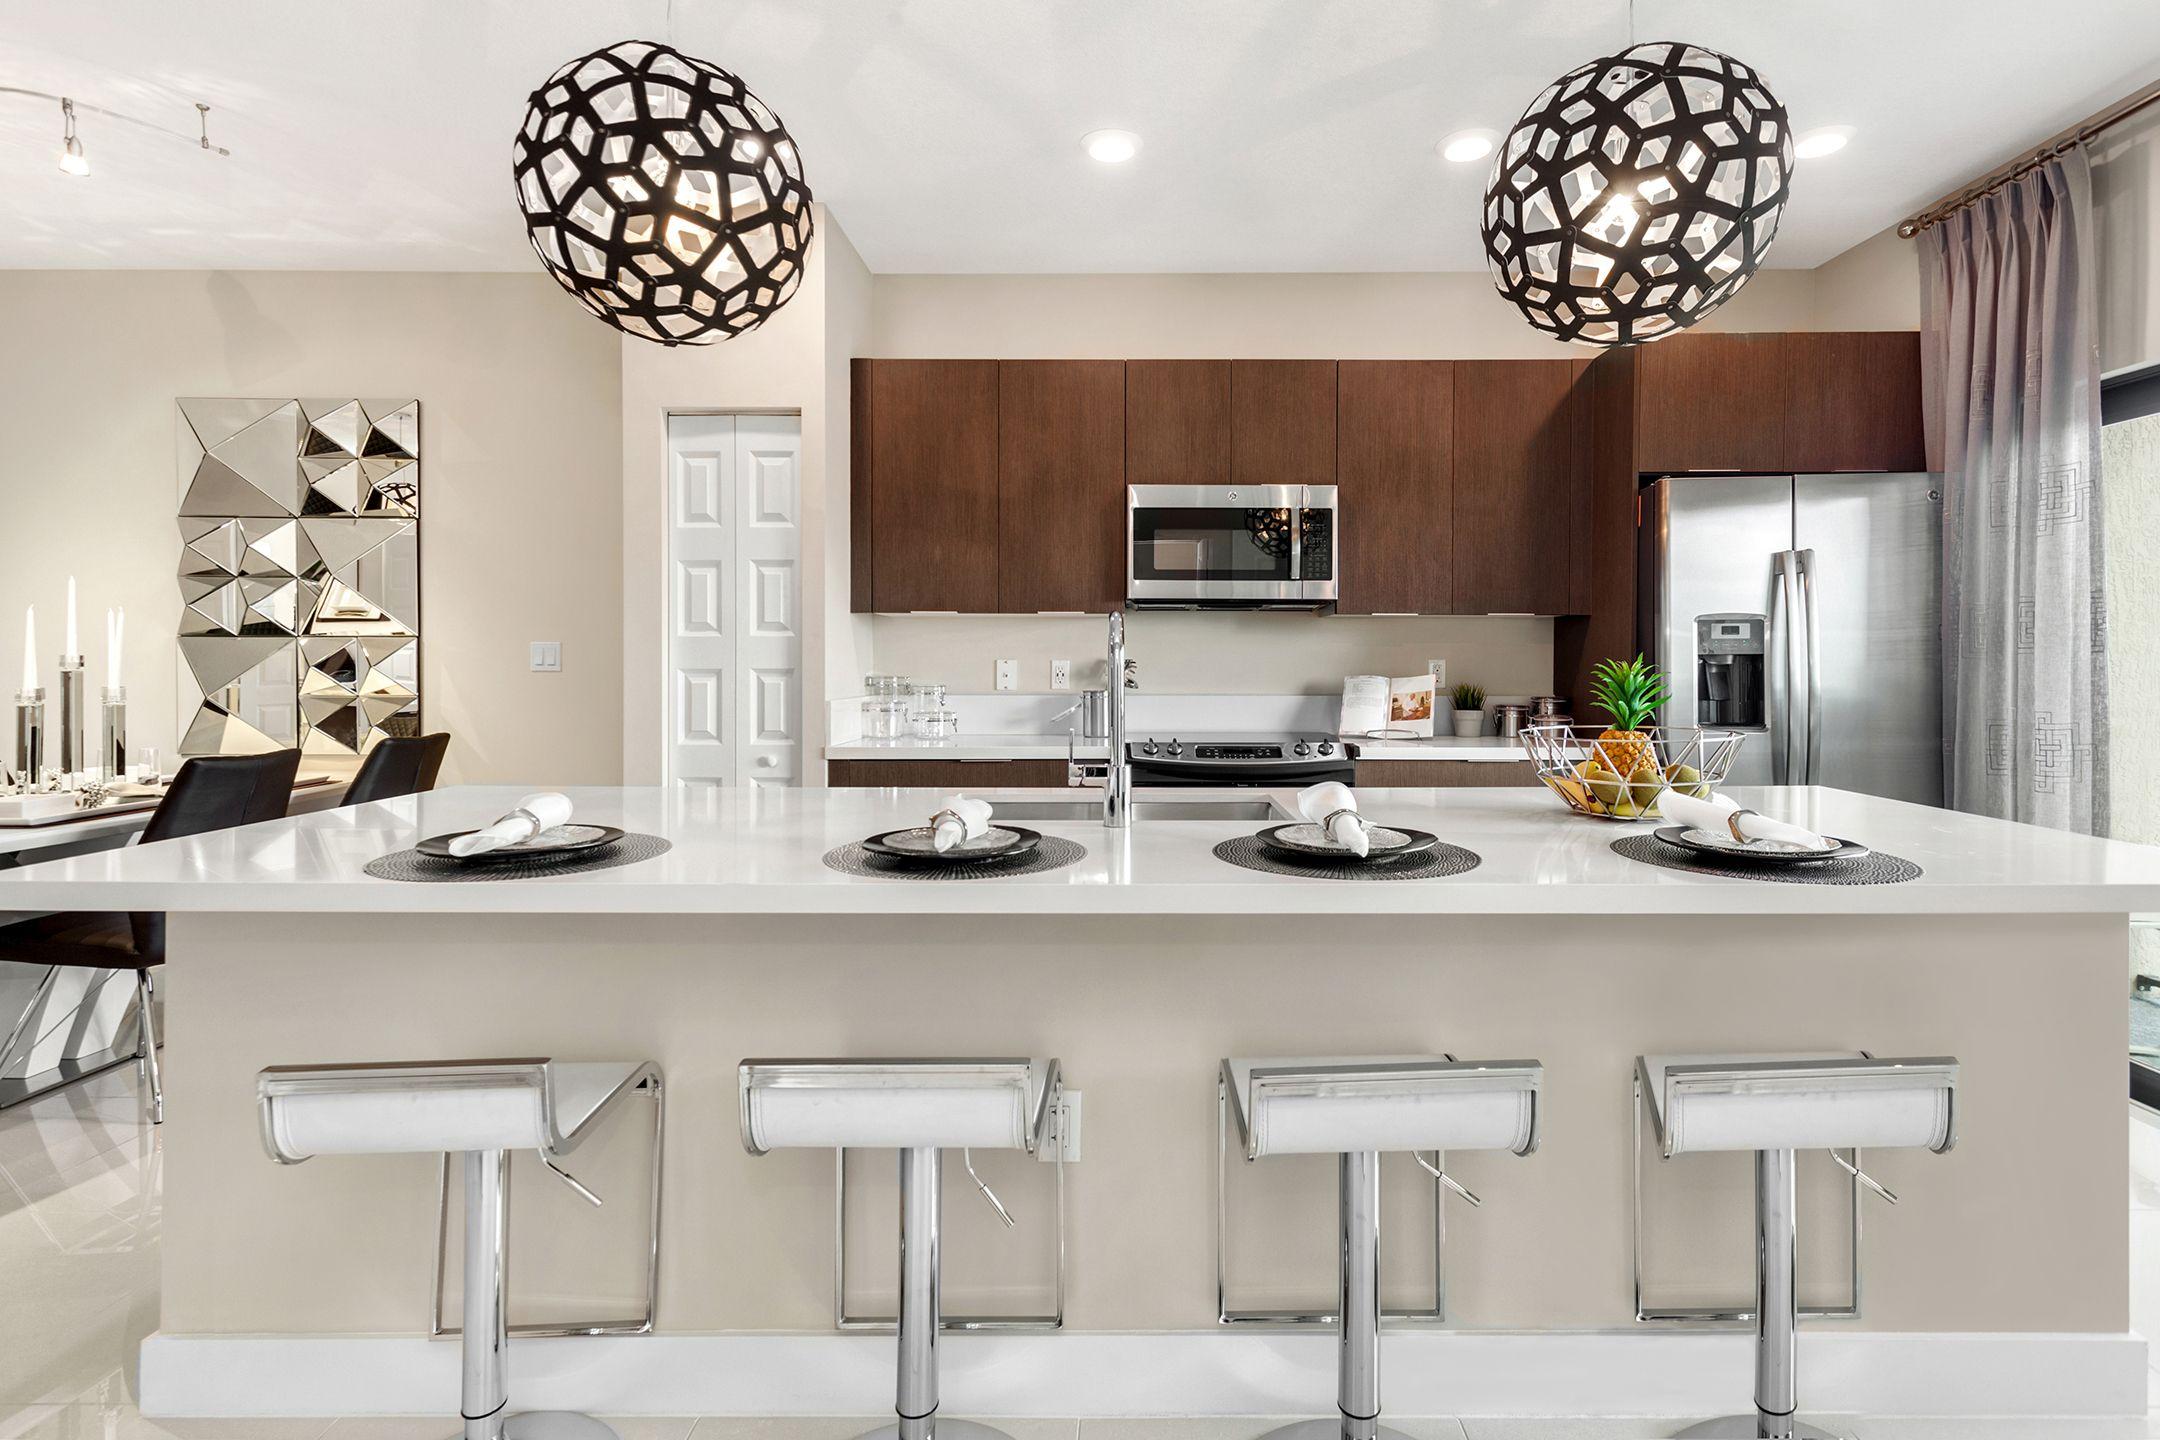 Modern Kitchen Design At Apex In Park Central S Cascade Home Brown